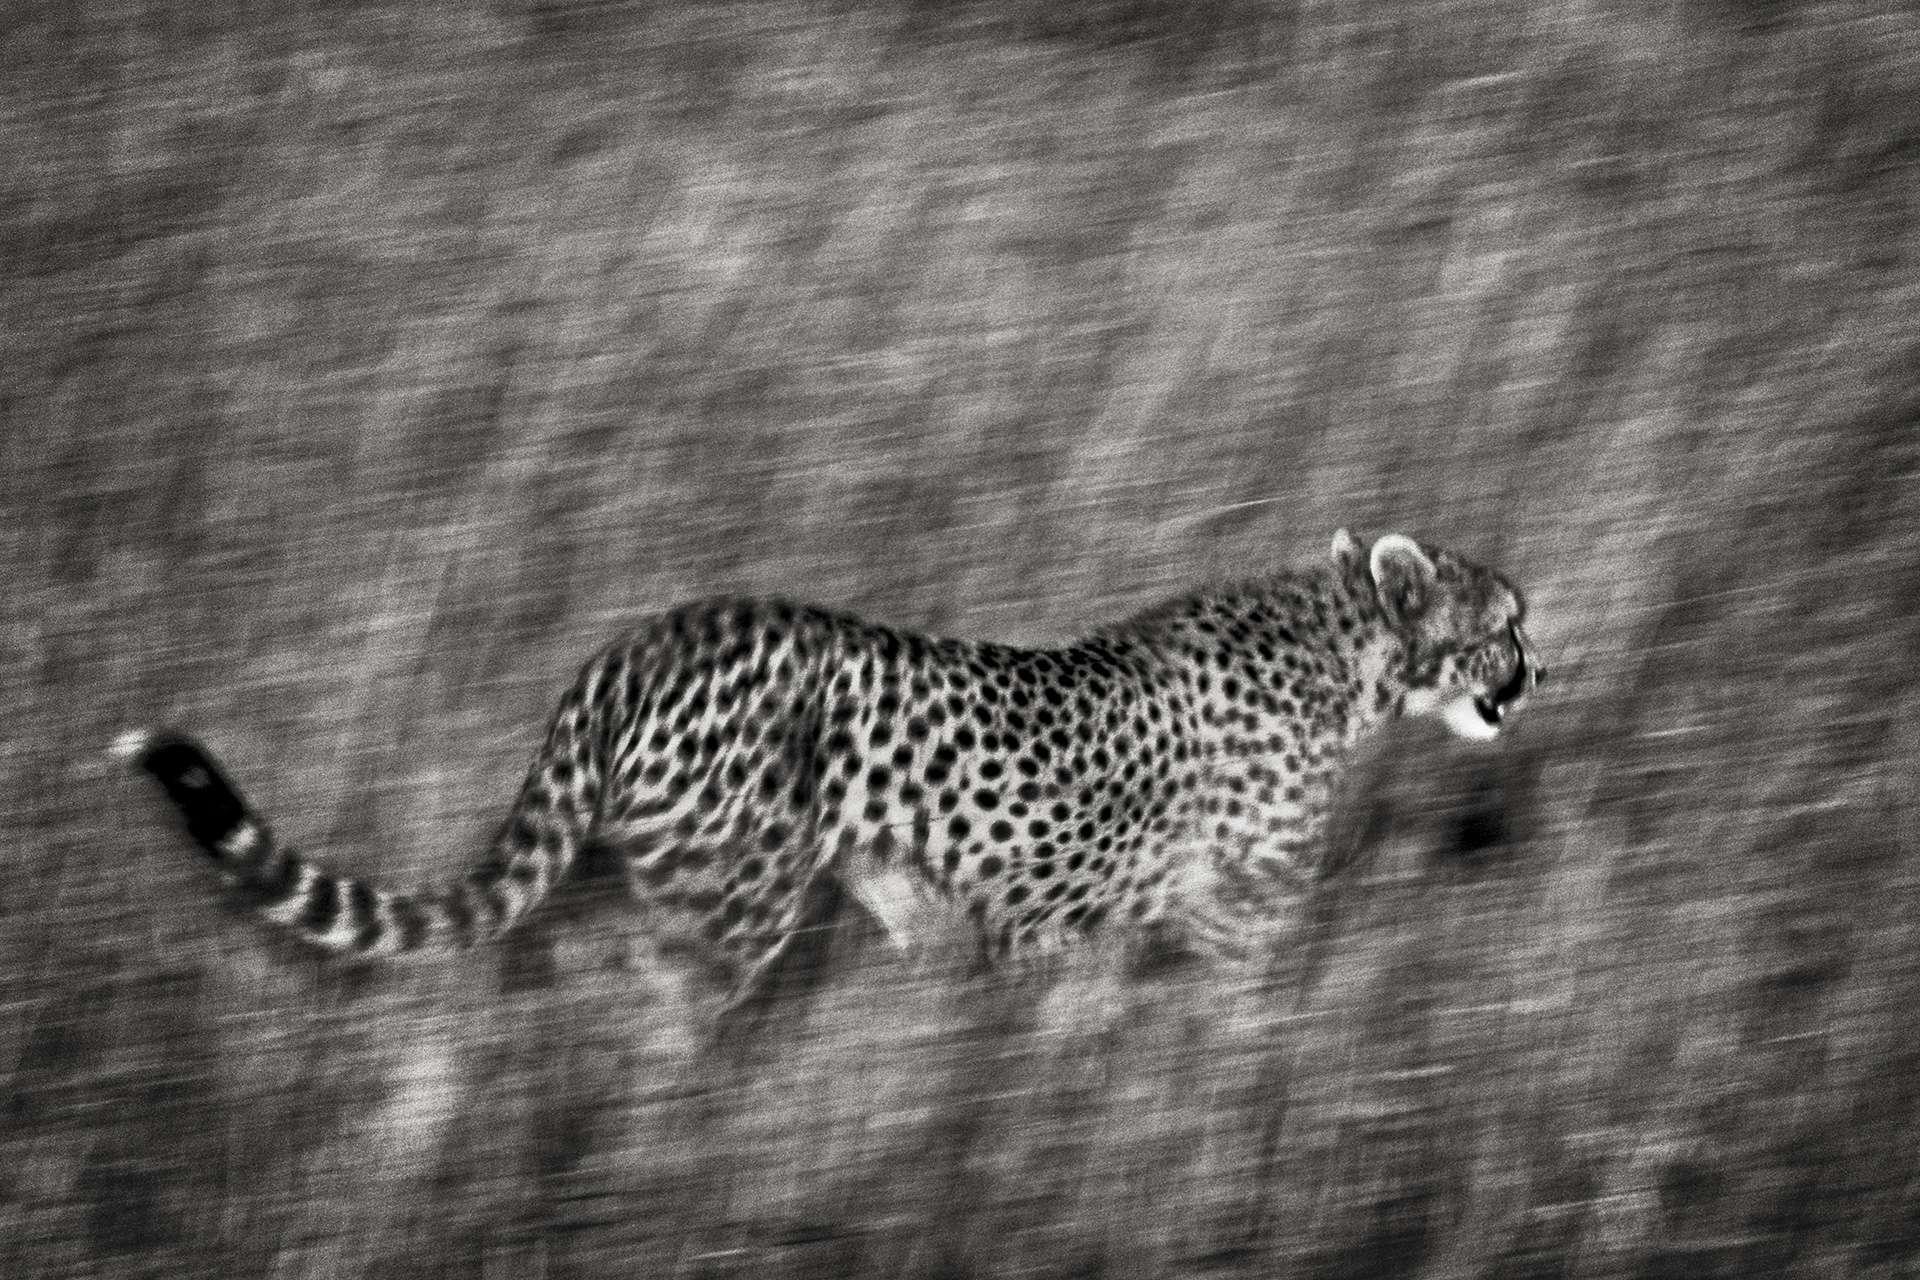 Photographie de Gilles Martin : guépard de Tanzanie, Struggle for life